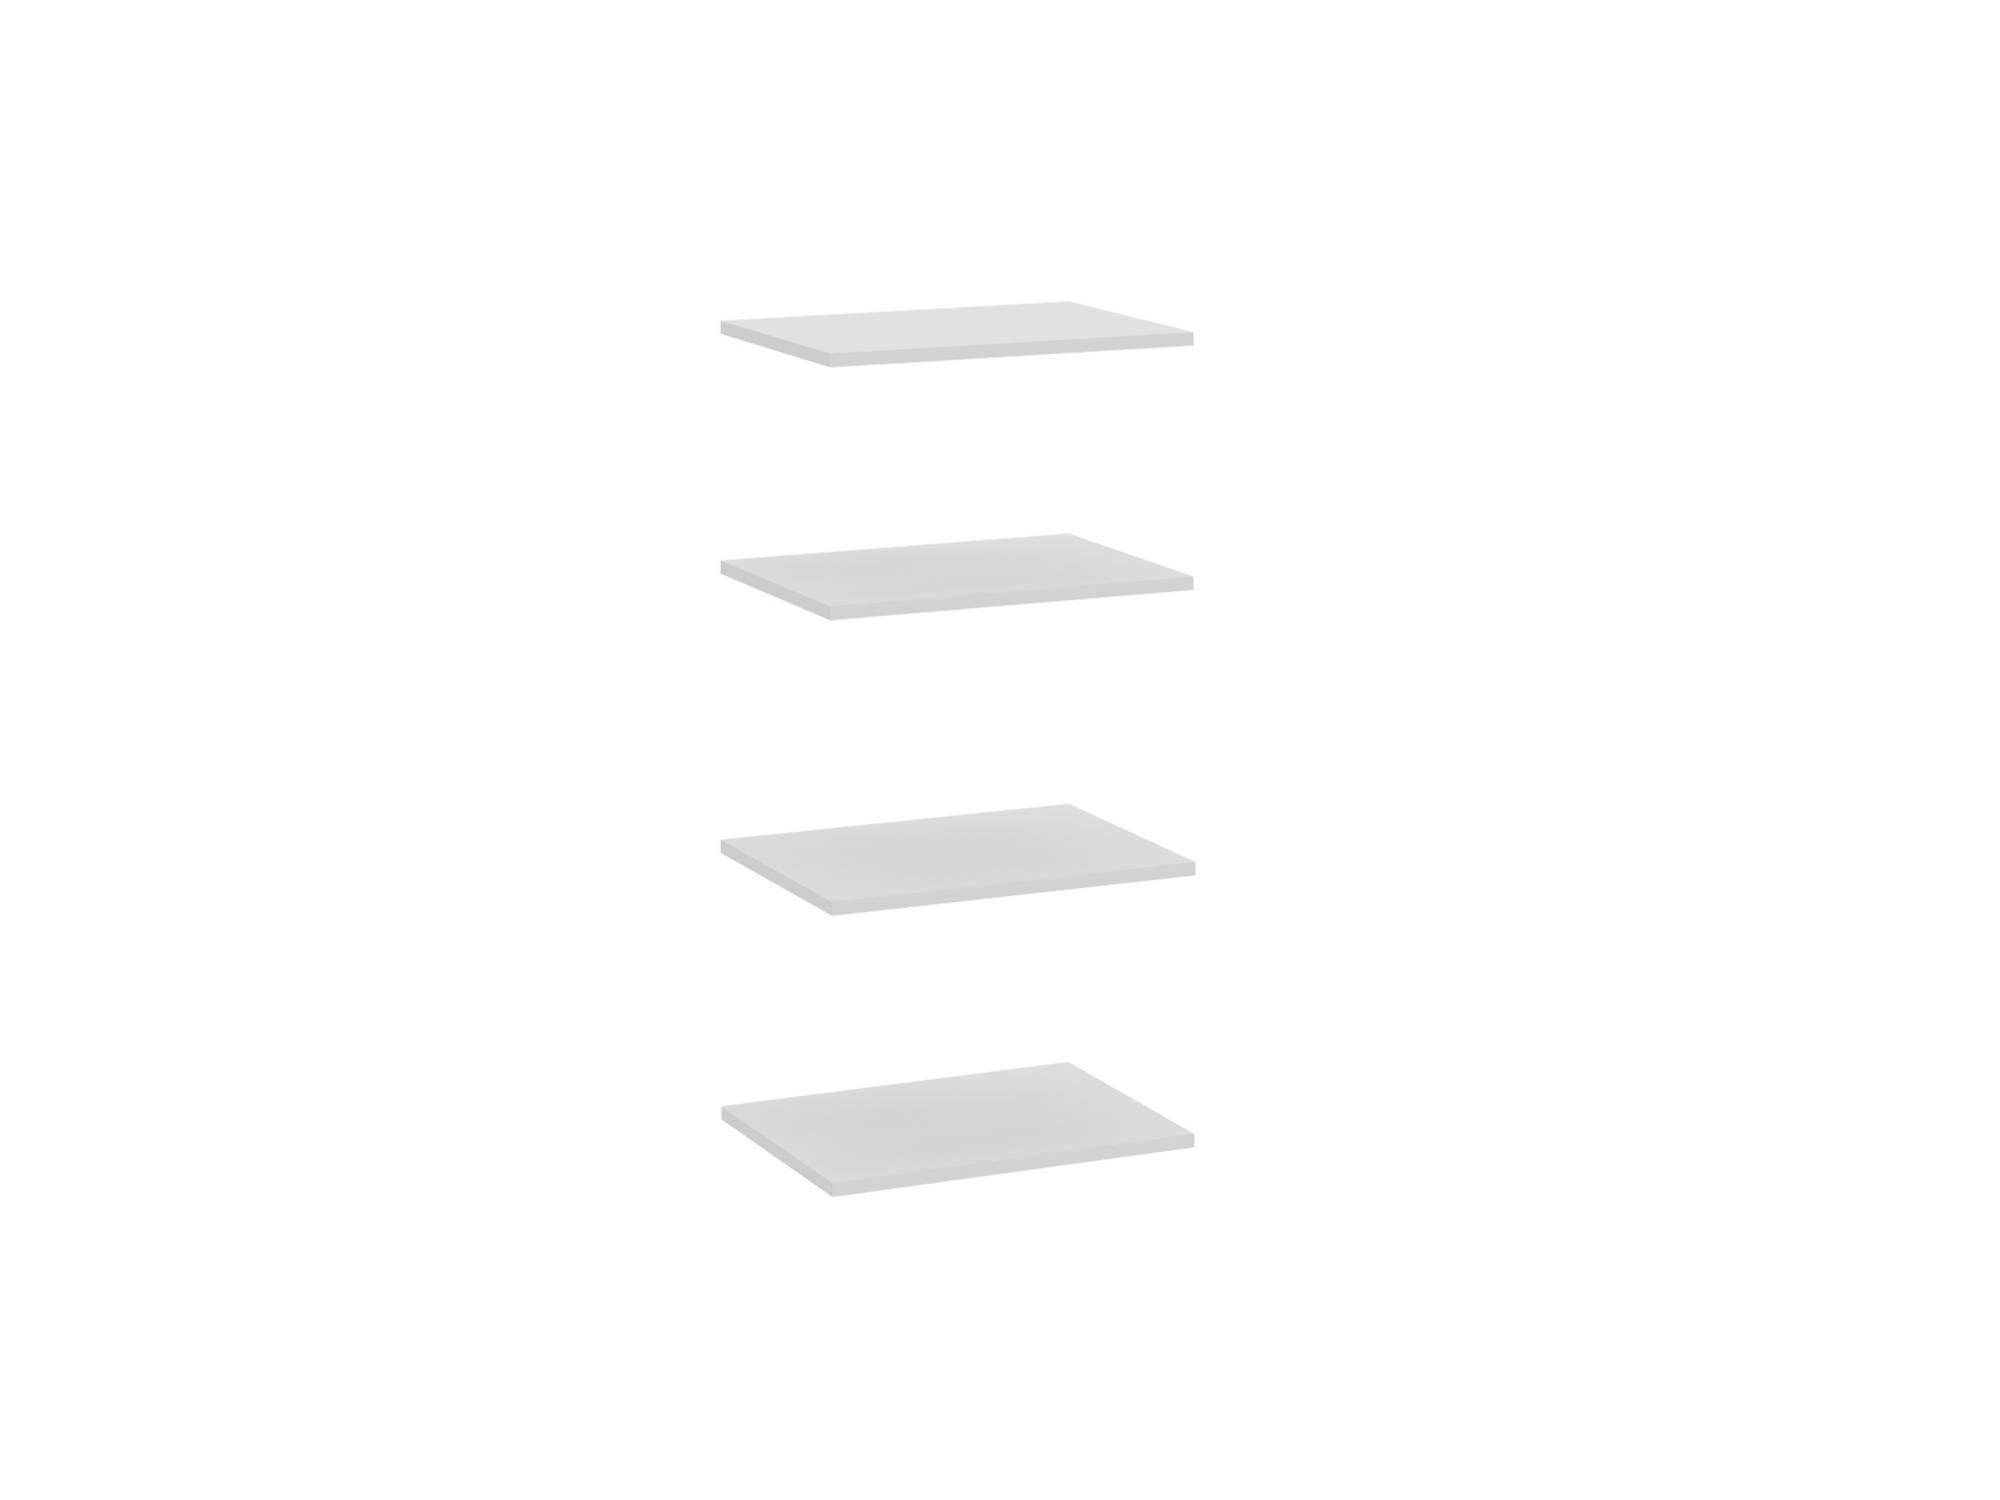 Комплект полок шкафа Ривьера